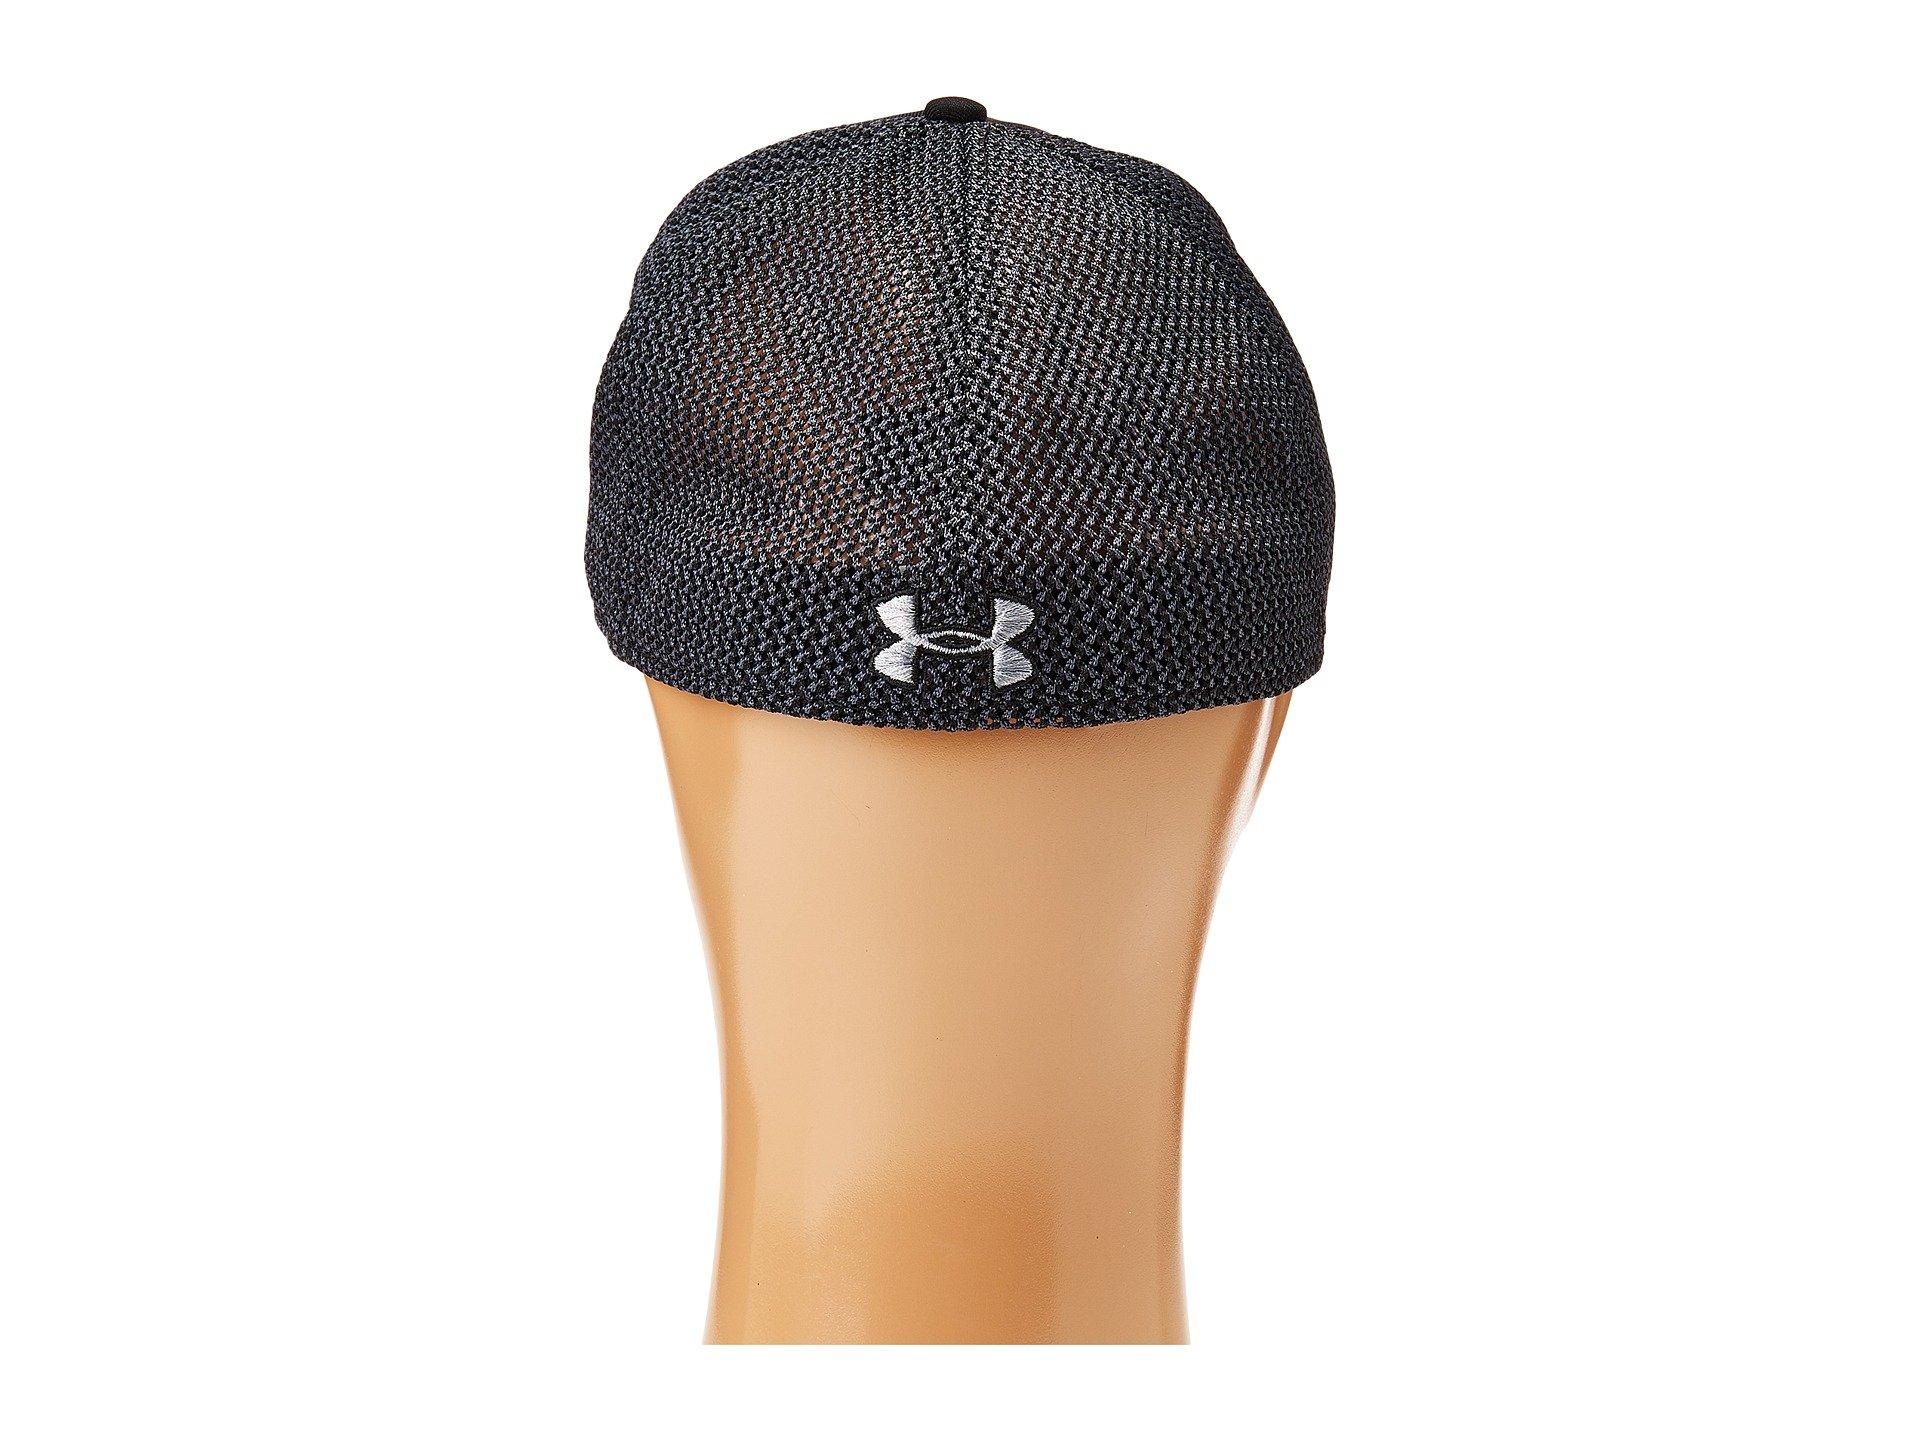 013efac0a84 Shop Under Armour Ua Twist Knit Low Crown Cap In Black Stealth Gray ...